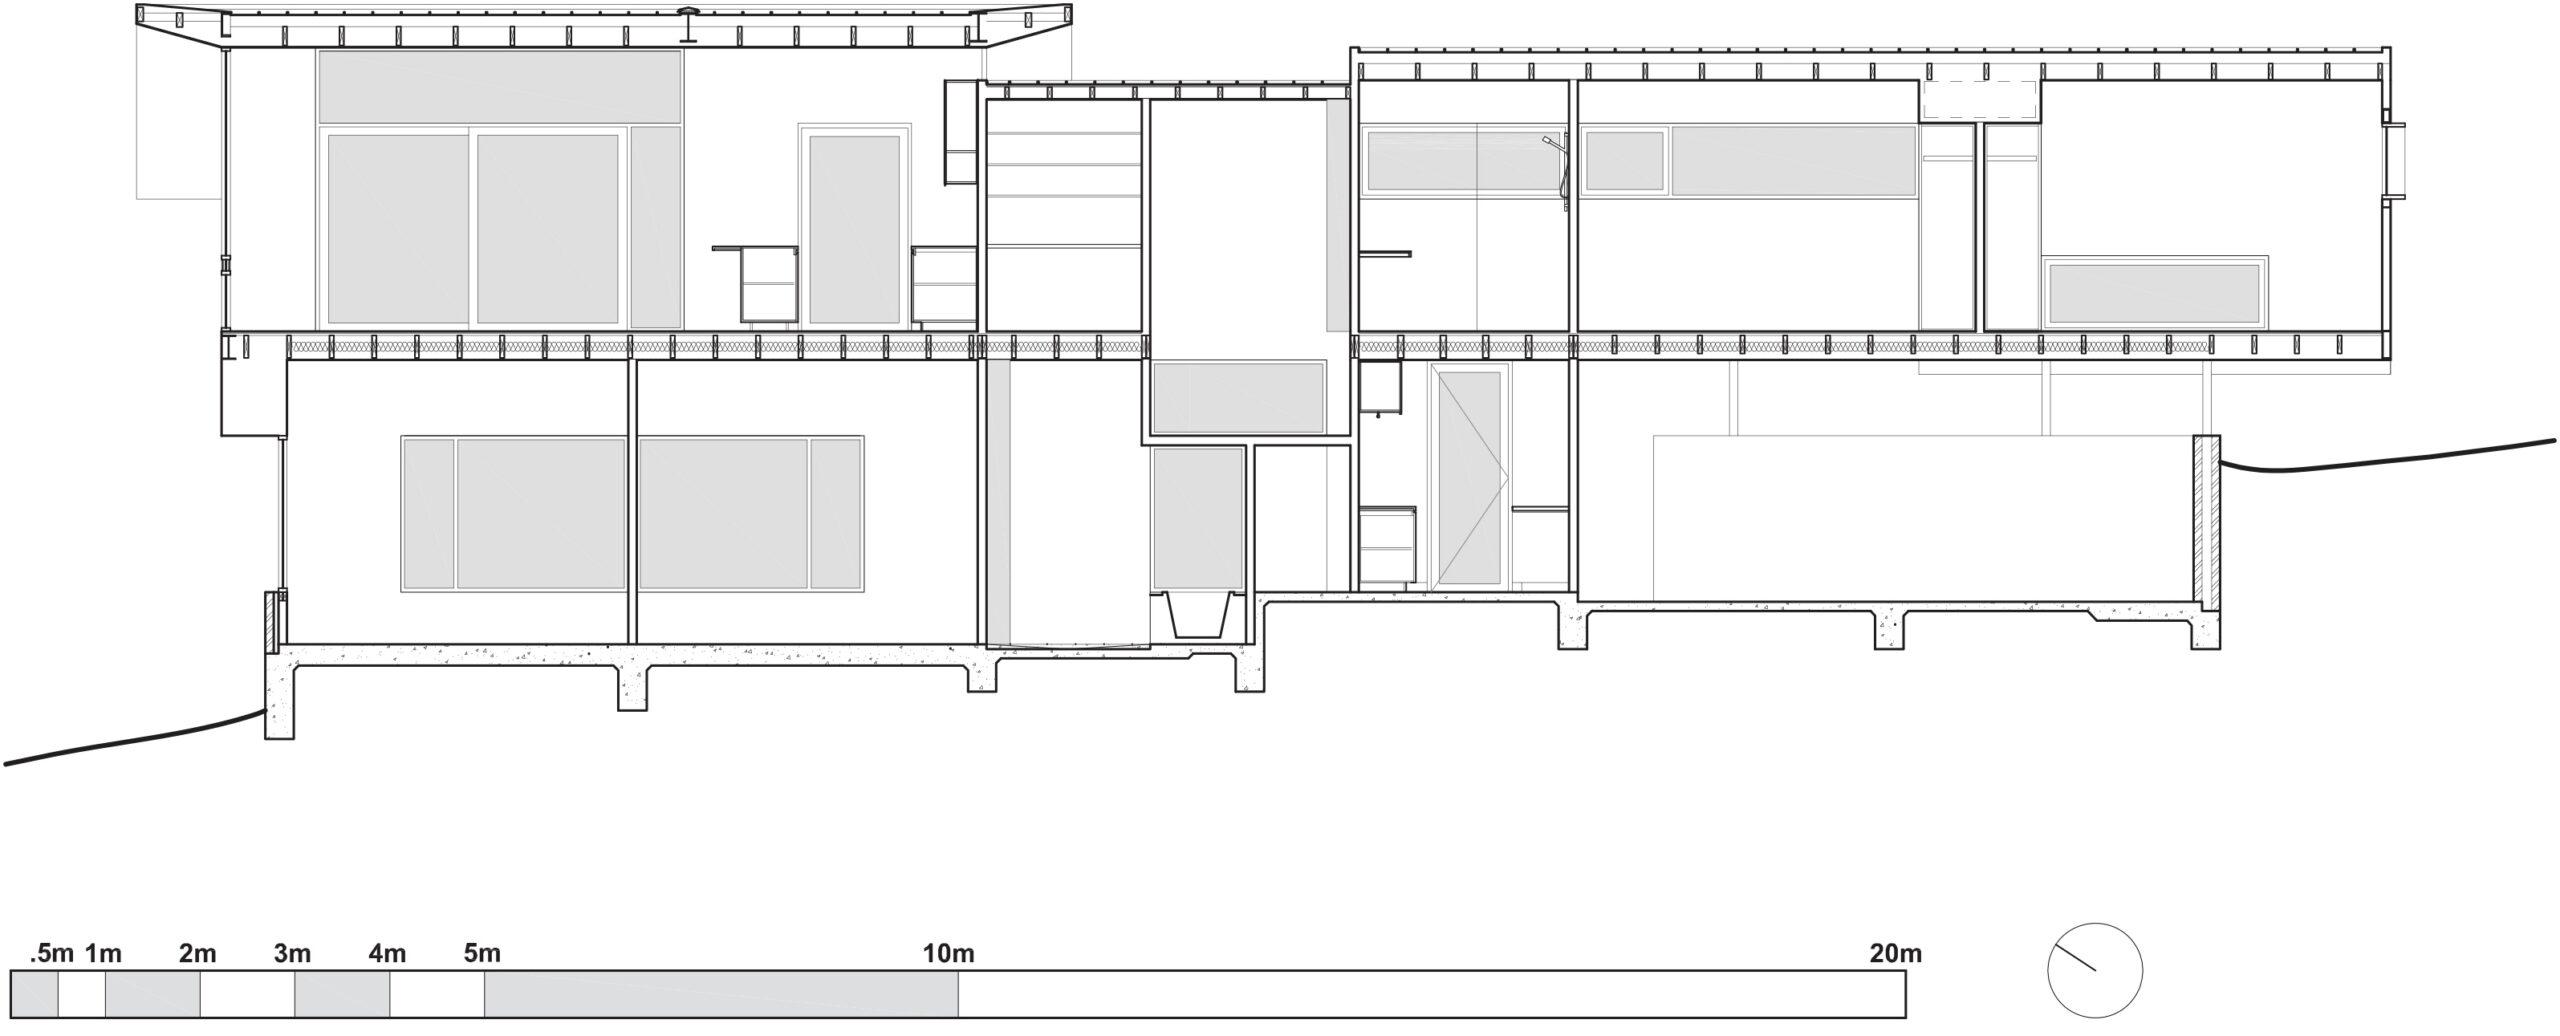 Section C 1-100 a4.ai